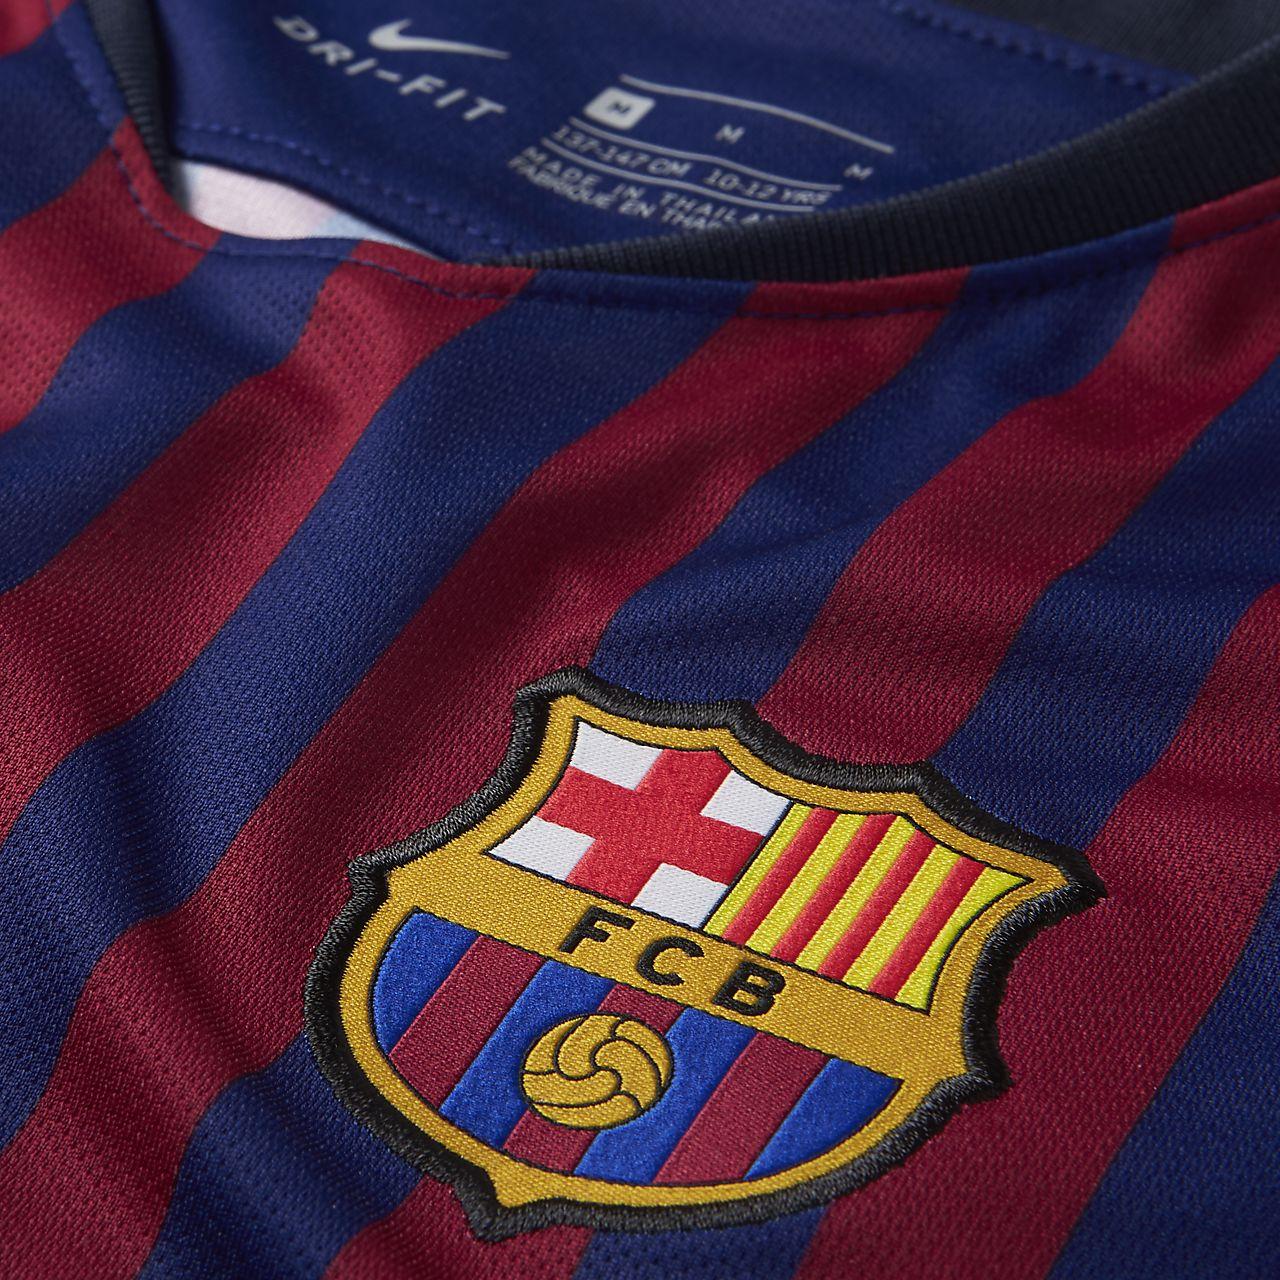 c57aa6094c7 2018 19 FC Barcelona Stadium Home Men s Soccer Jersey. Nike.com